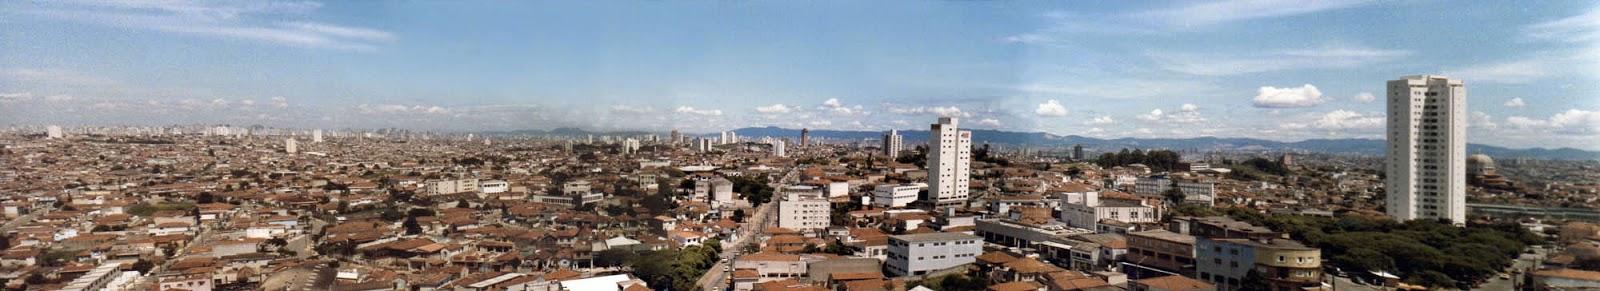 Vila Santa Isabel, Zona Leste de São Paulo, história de São Paulo, bairros de São Paulo, Vila Formosa, Vila Carrão